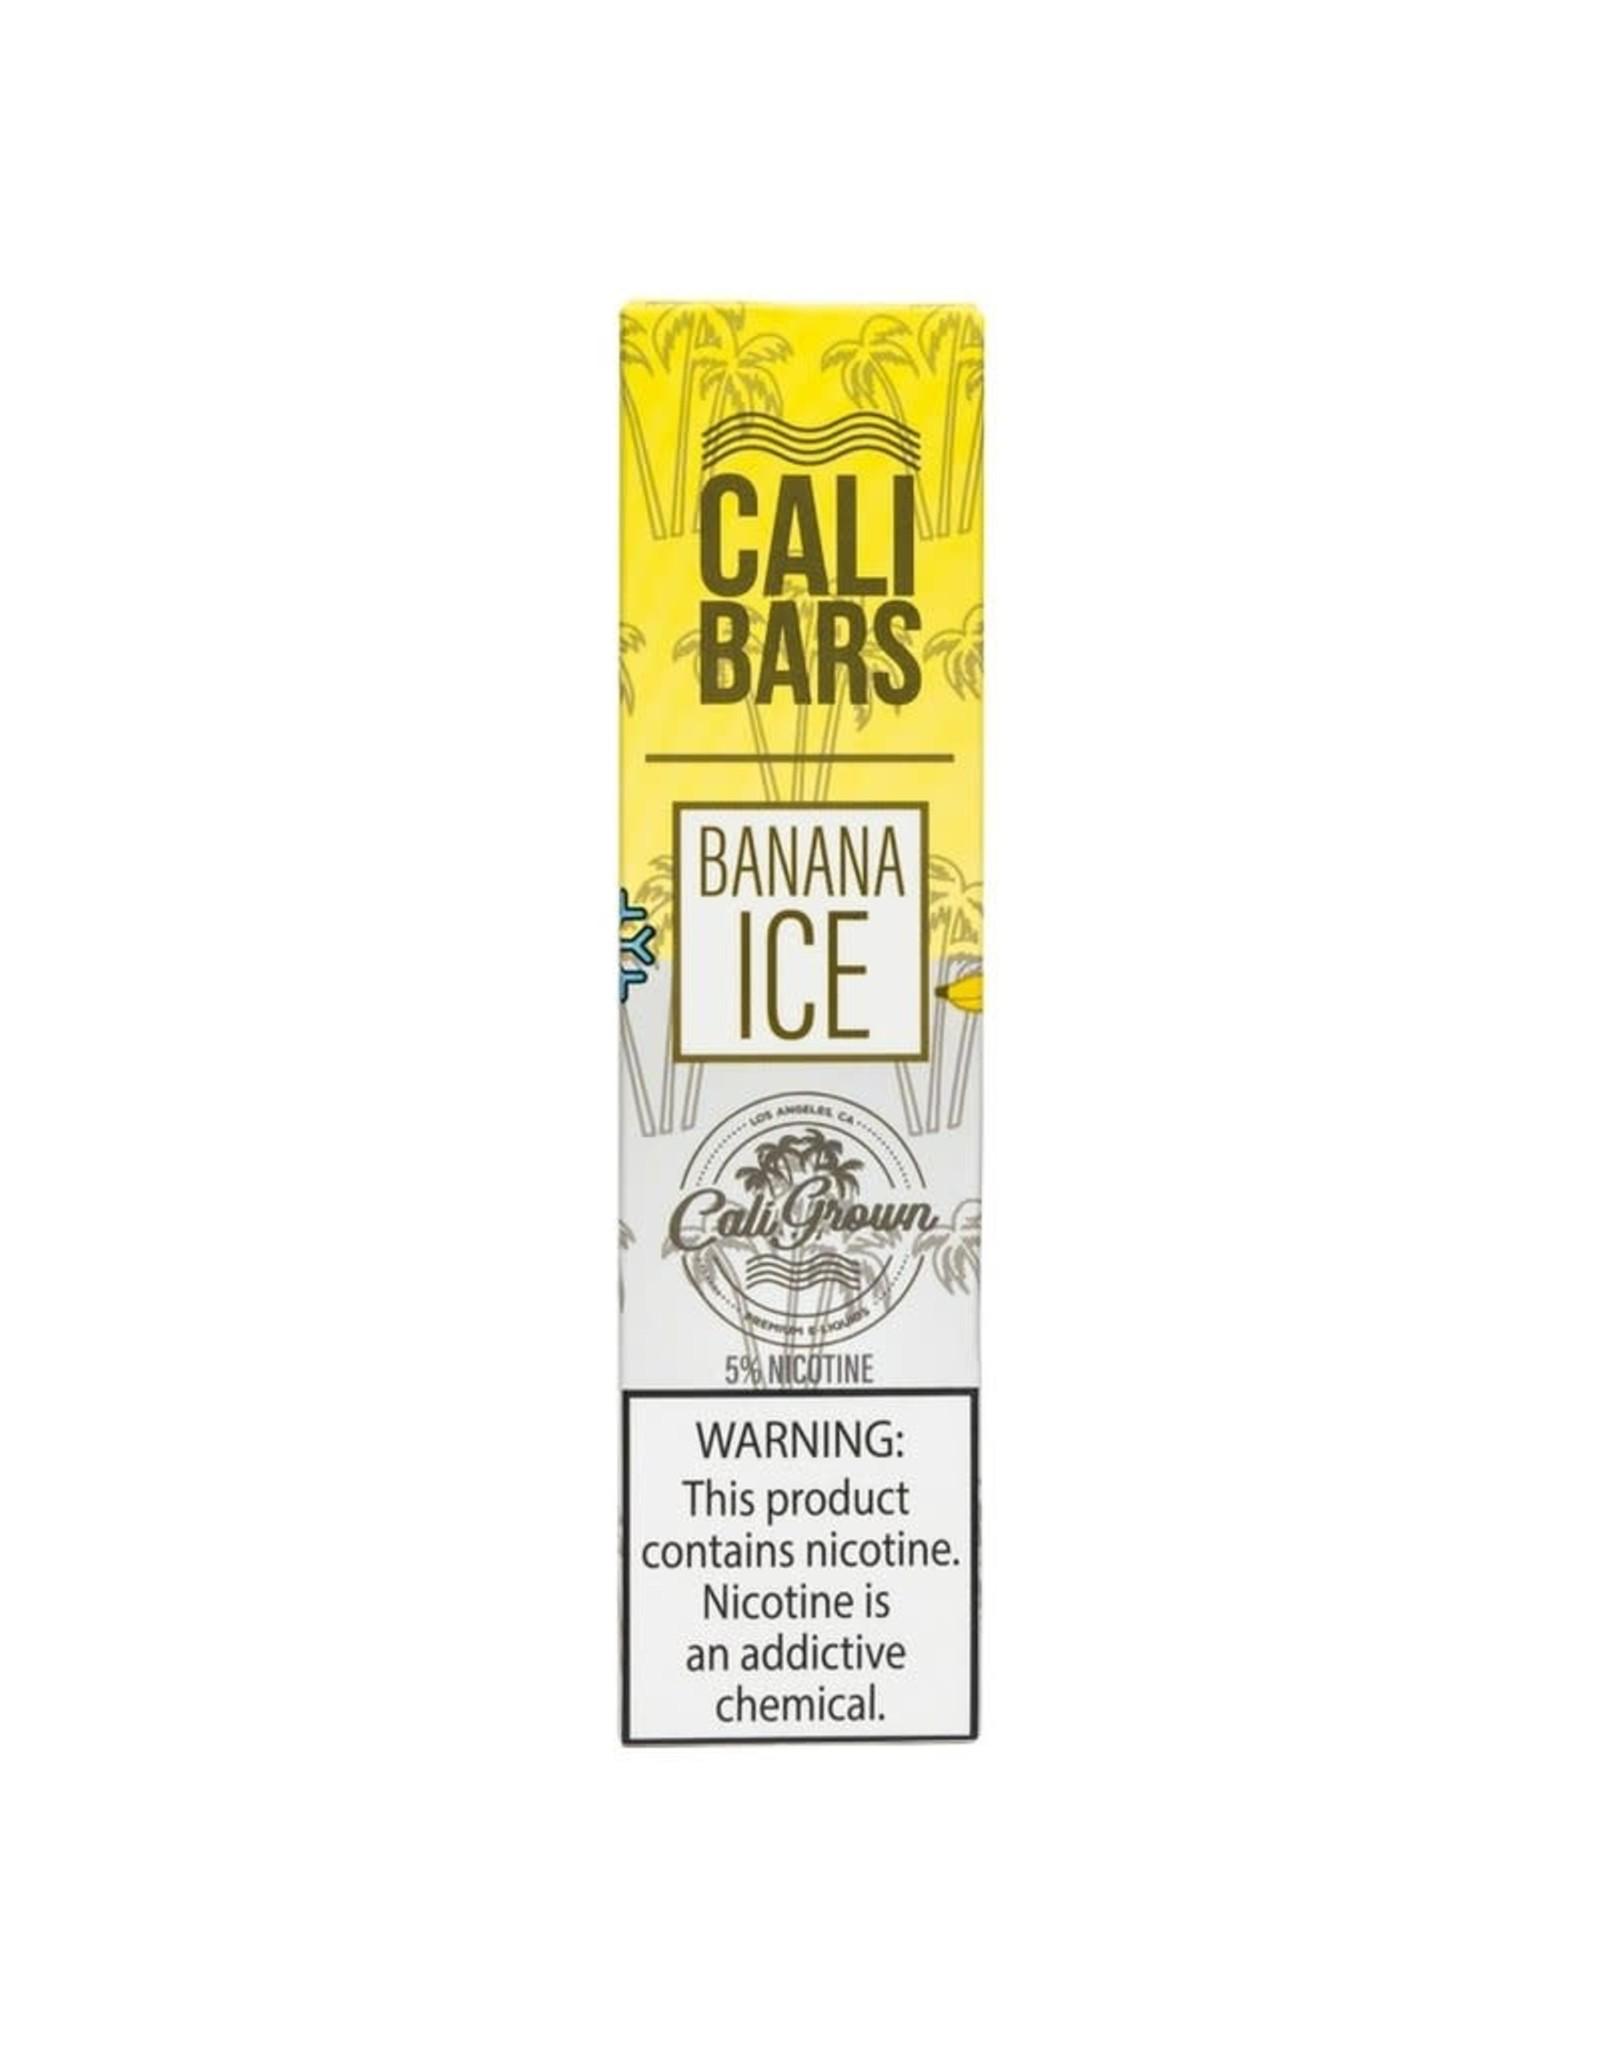 Cali Bars Cali Bars Banana Ice 5%